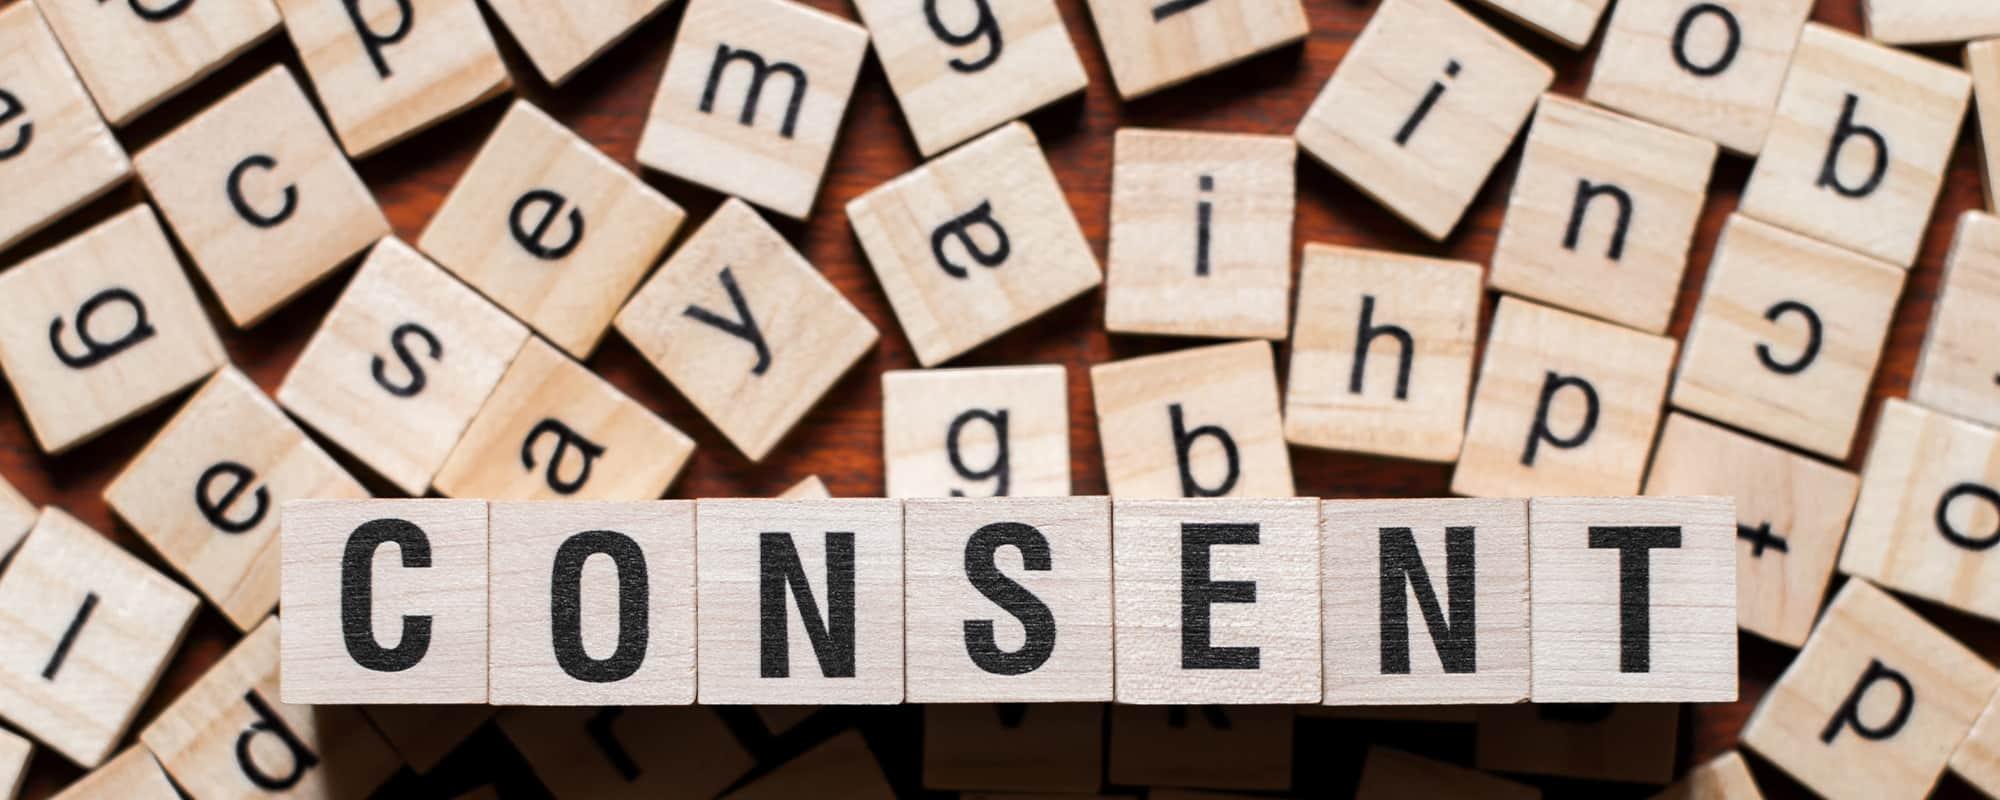 Children Left Vulnerable As Parents Avoid Teaching Consent